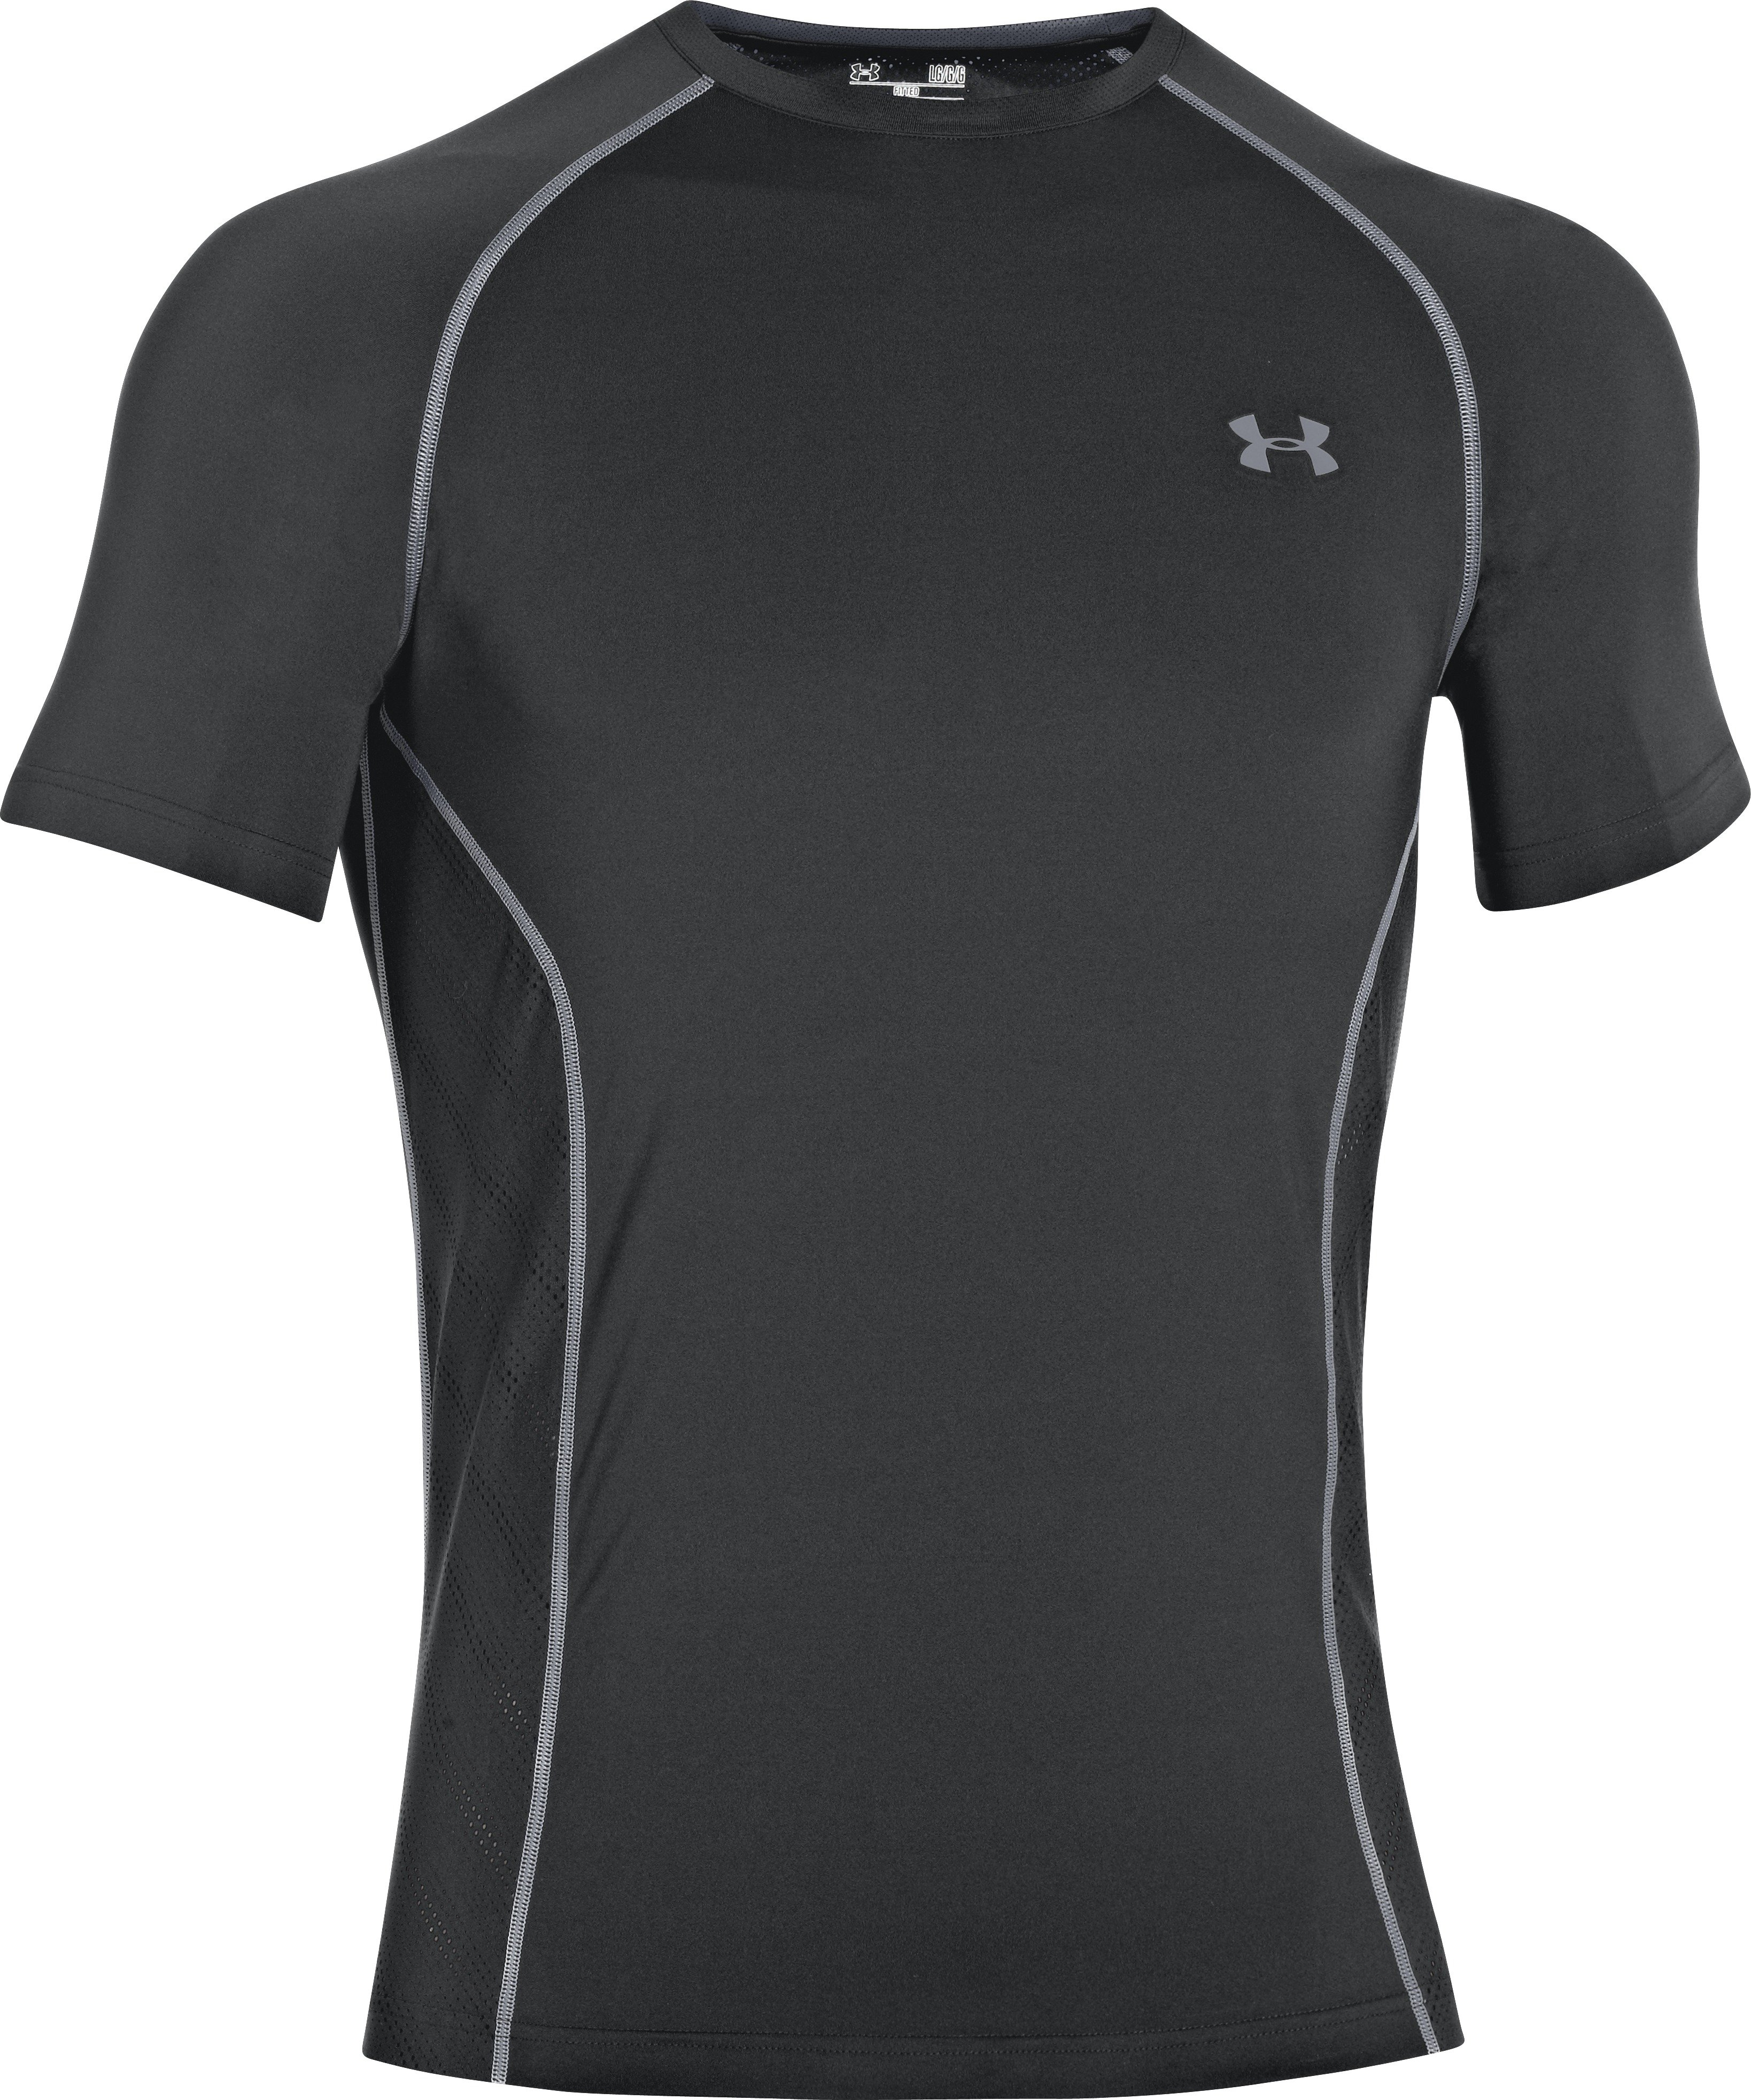 Under Armour Tee-shirt HeatGear Sonic ArmourVent M v�tement running homme